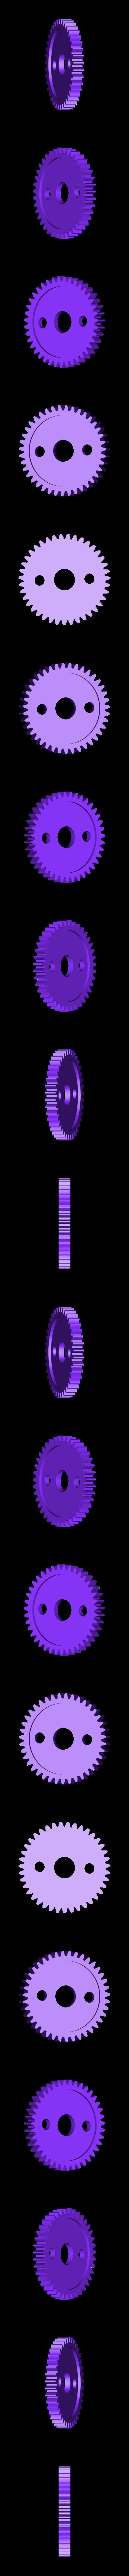 Table-SAW - Gear-Second-1.STL Download free STL file Table SAW • 3D print object, perinski